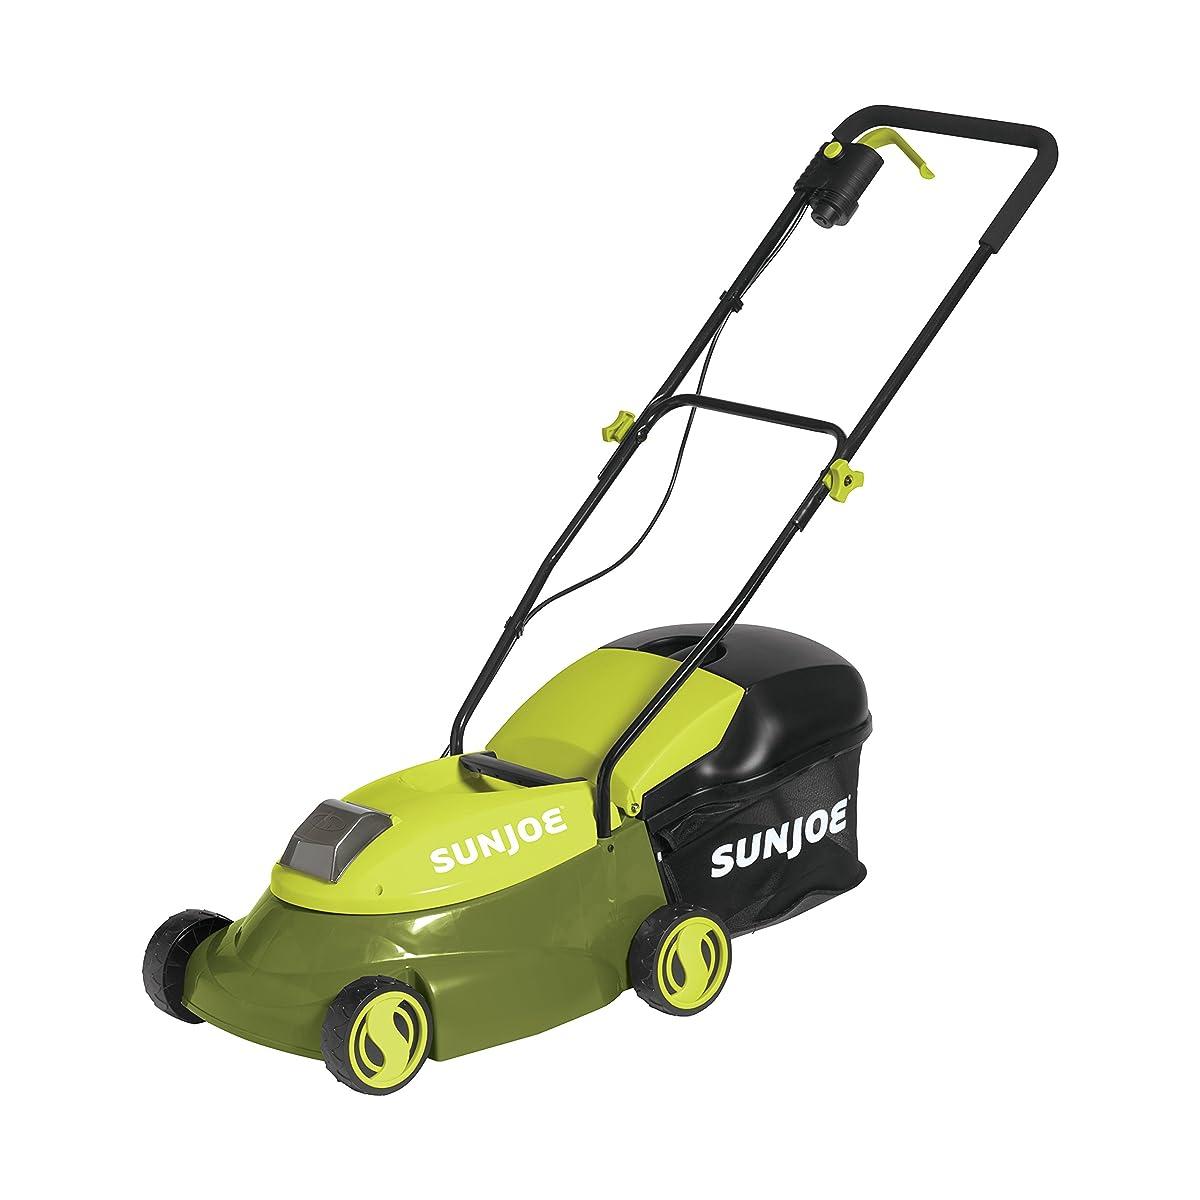 Sun Joe MJ401C 14-Inch 28-Volt Cordless Push Lawn Mower